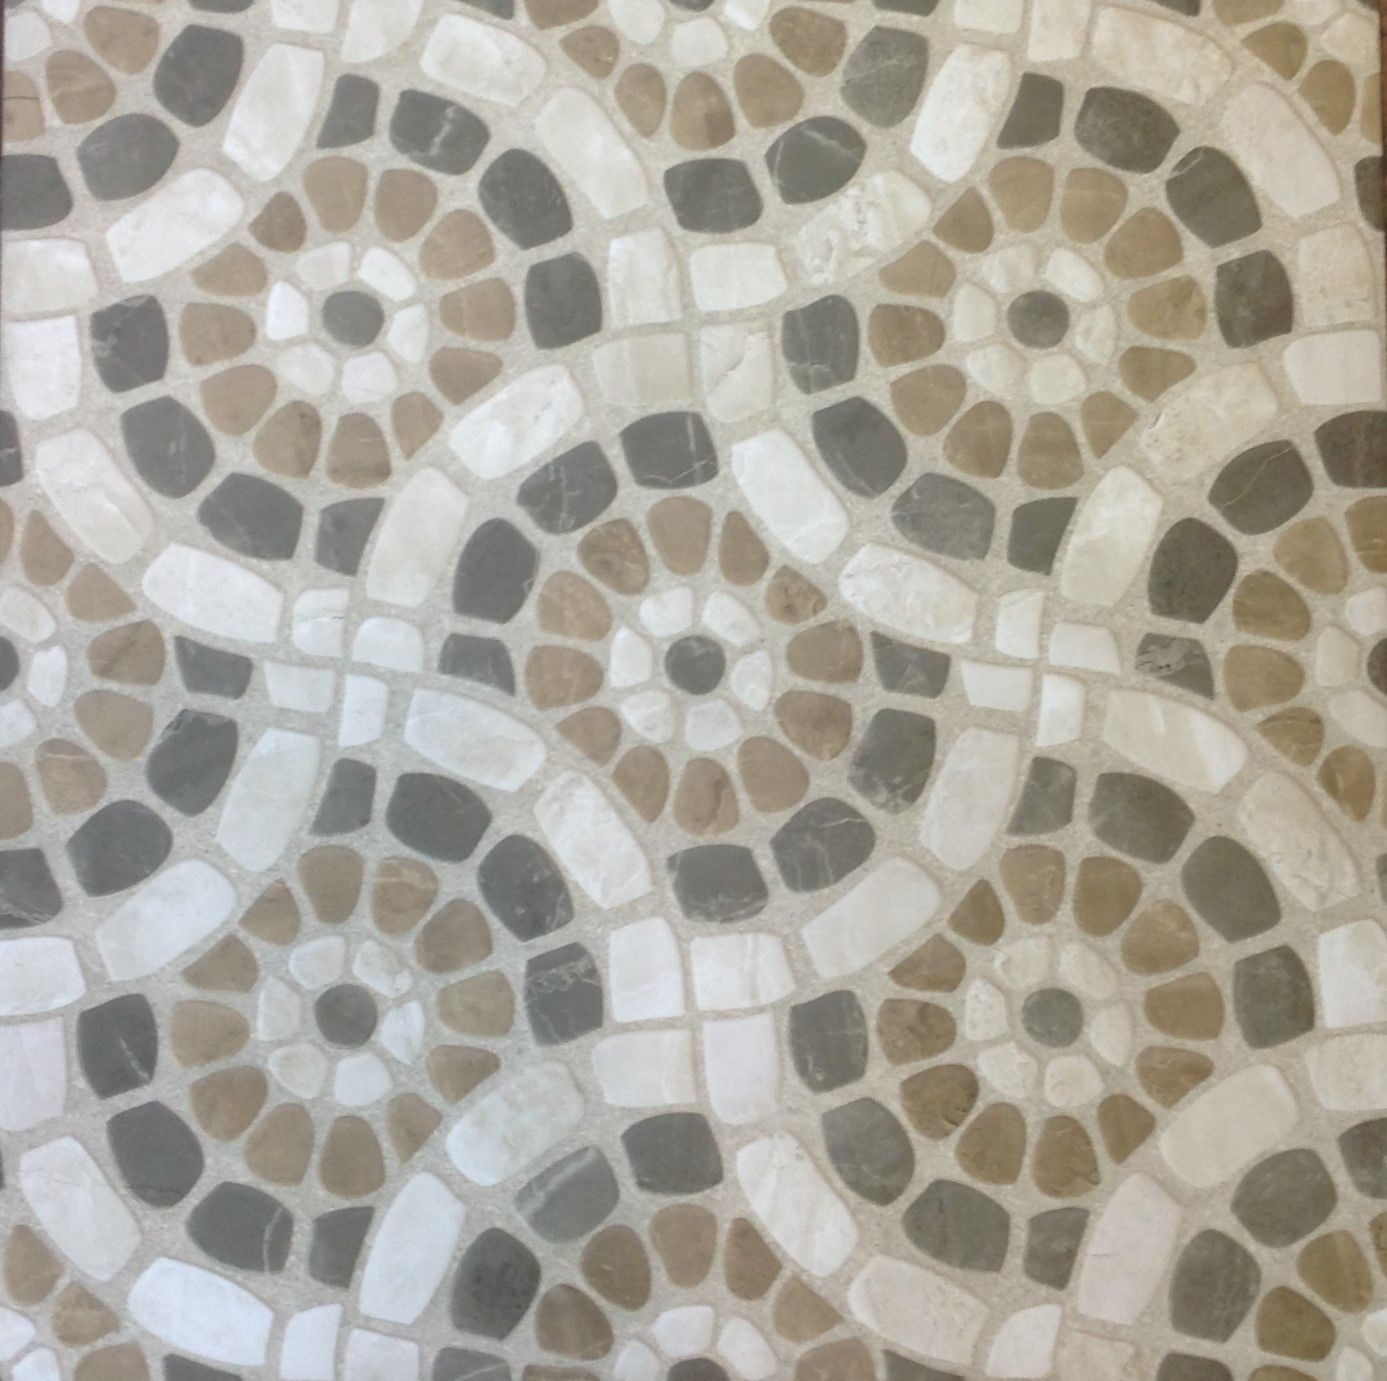 Patio Pebble Look Decor Ceramic Floor Tile 24 X24 Ceramic Floor Tile Patio Tiles Outdoor Tiles